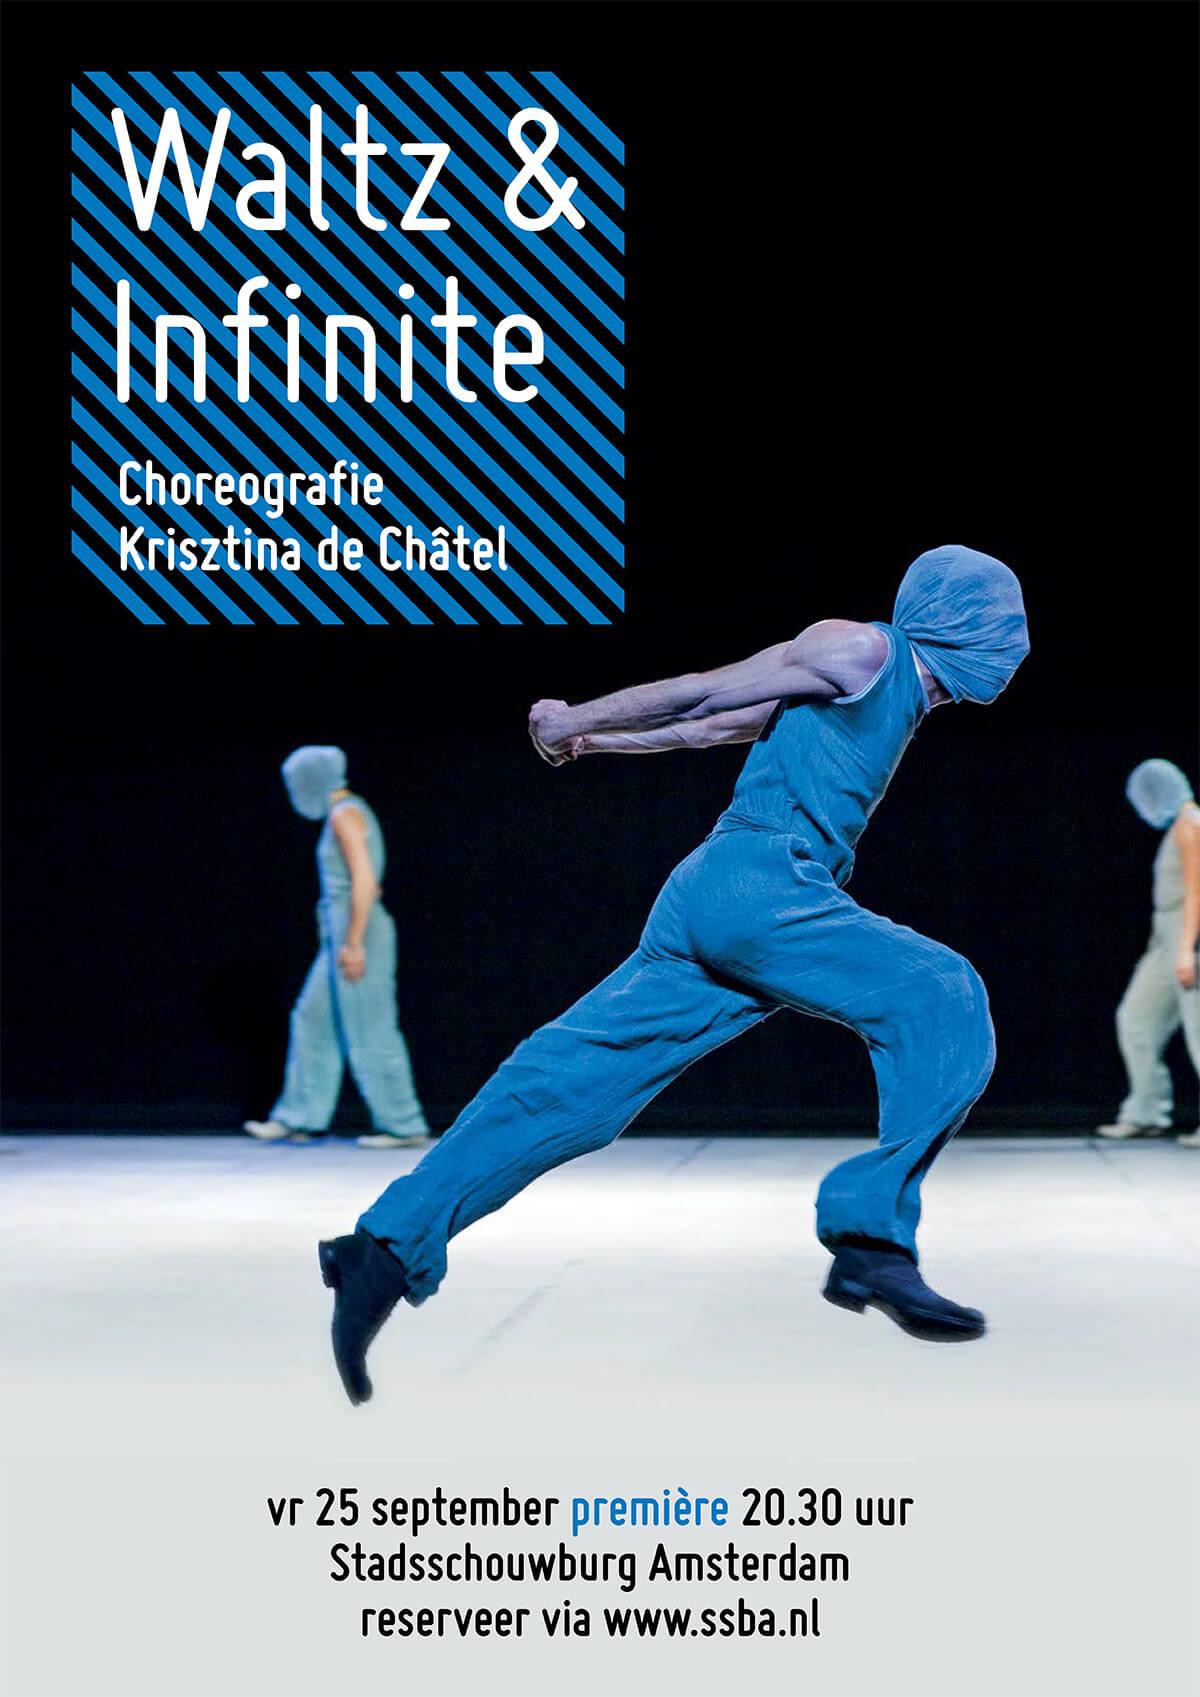 Krisztina de Châtel - Waltz & Infinite